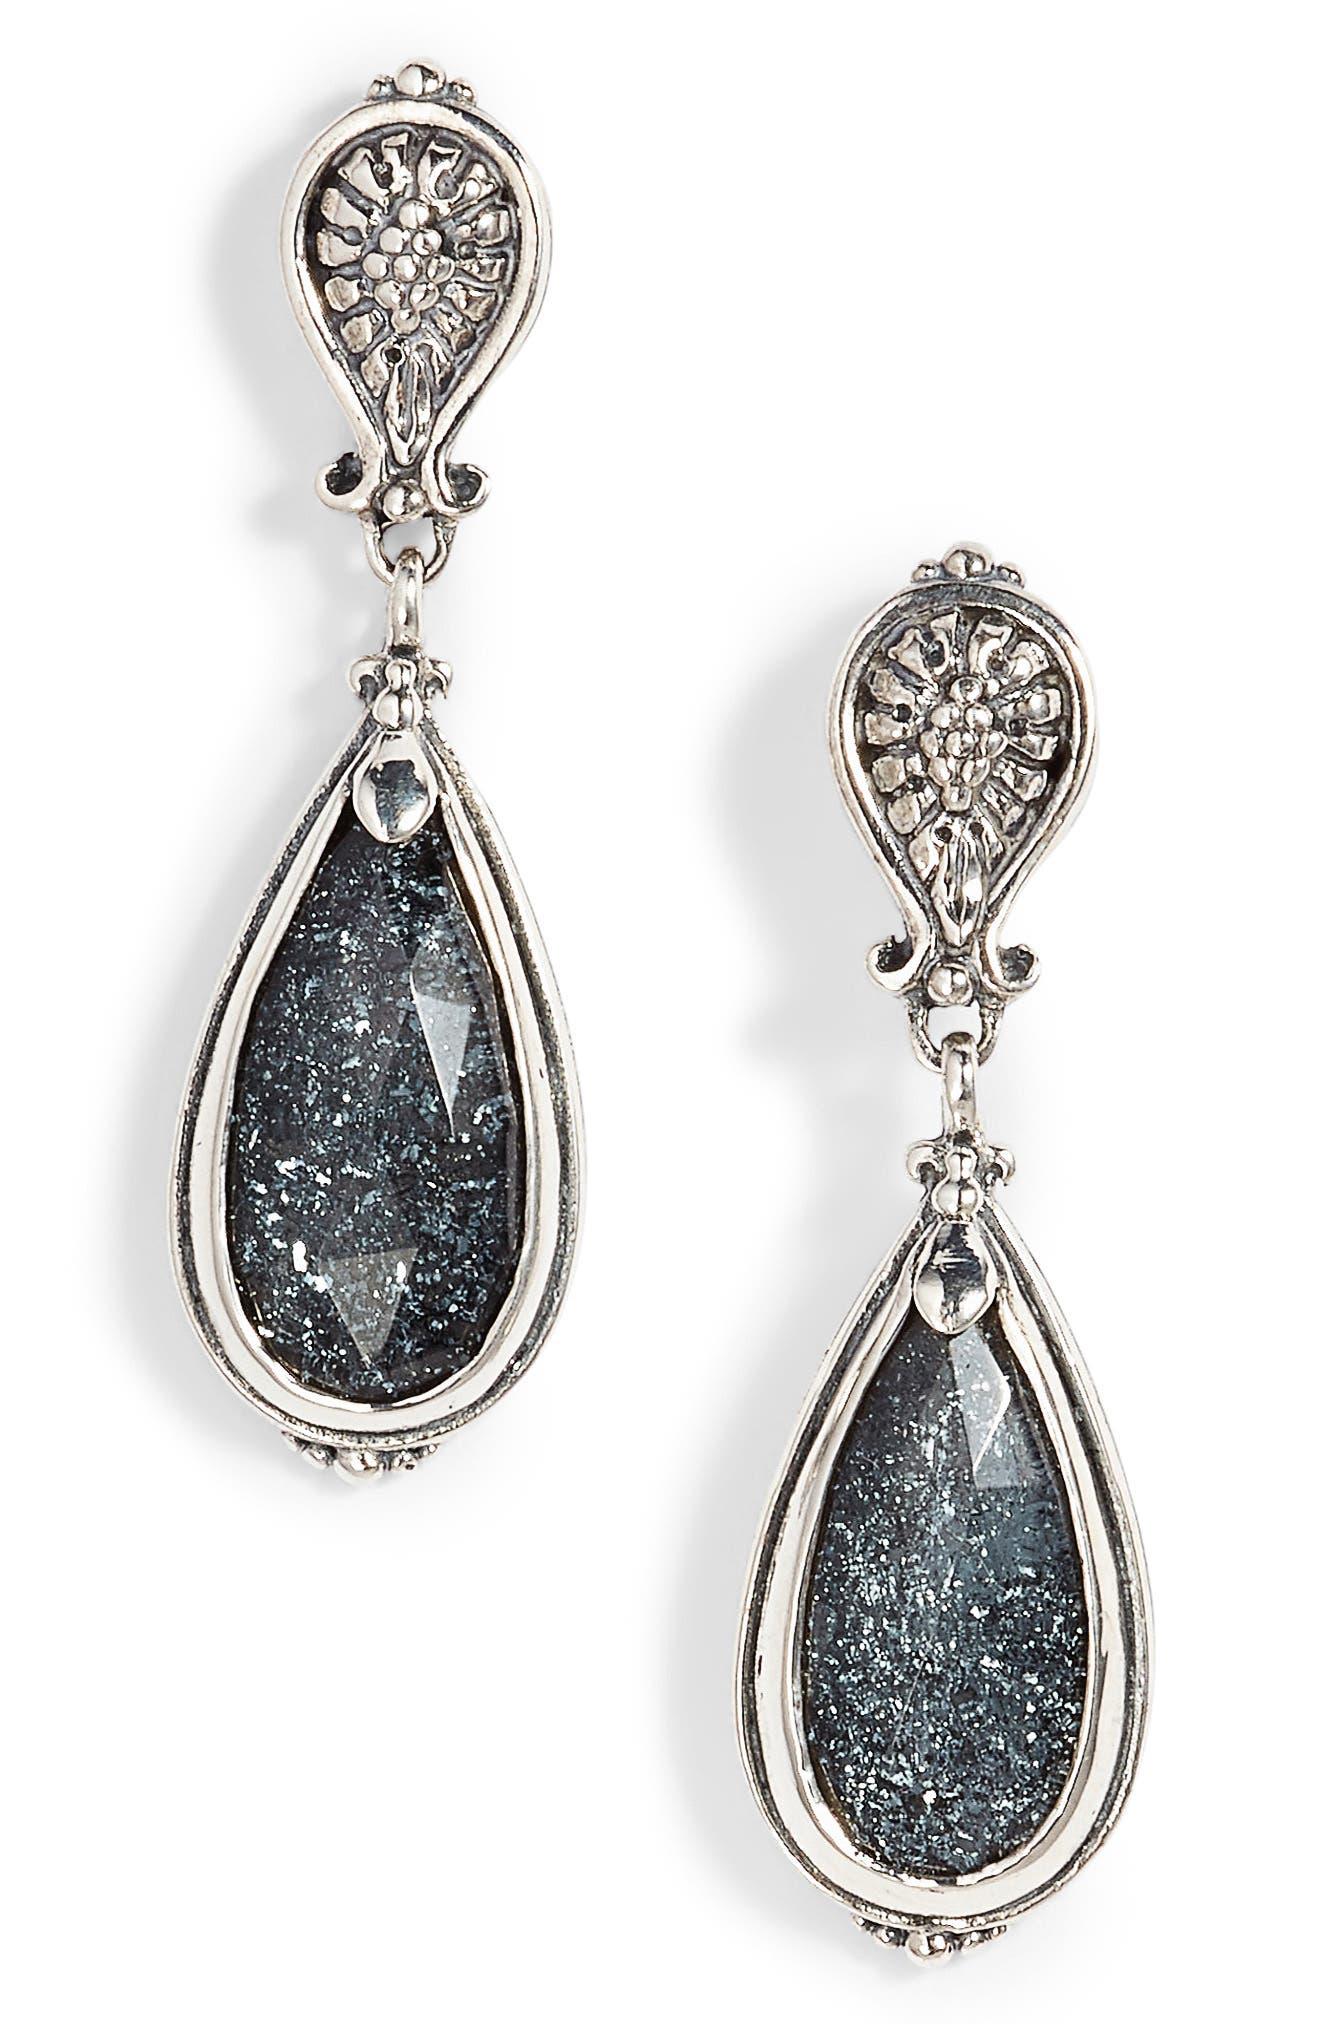 Santorini Spinel Drop Earrings,                             Main thumbnail 1, color,                             Silver/ Hematite